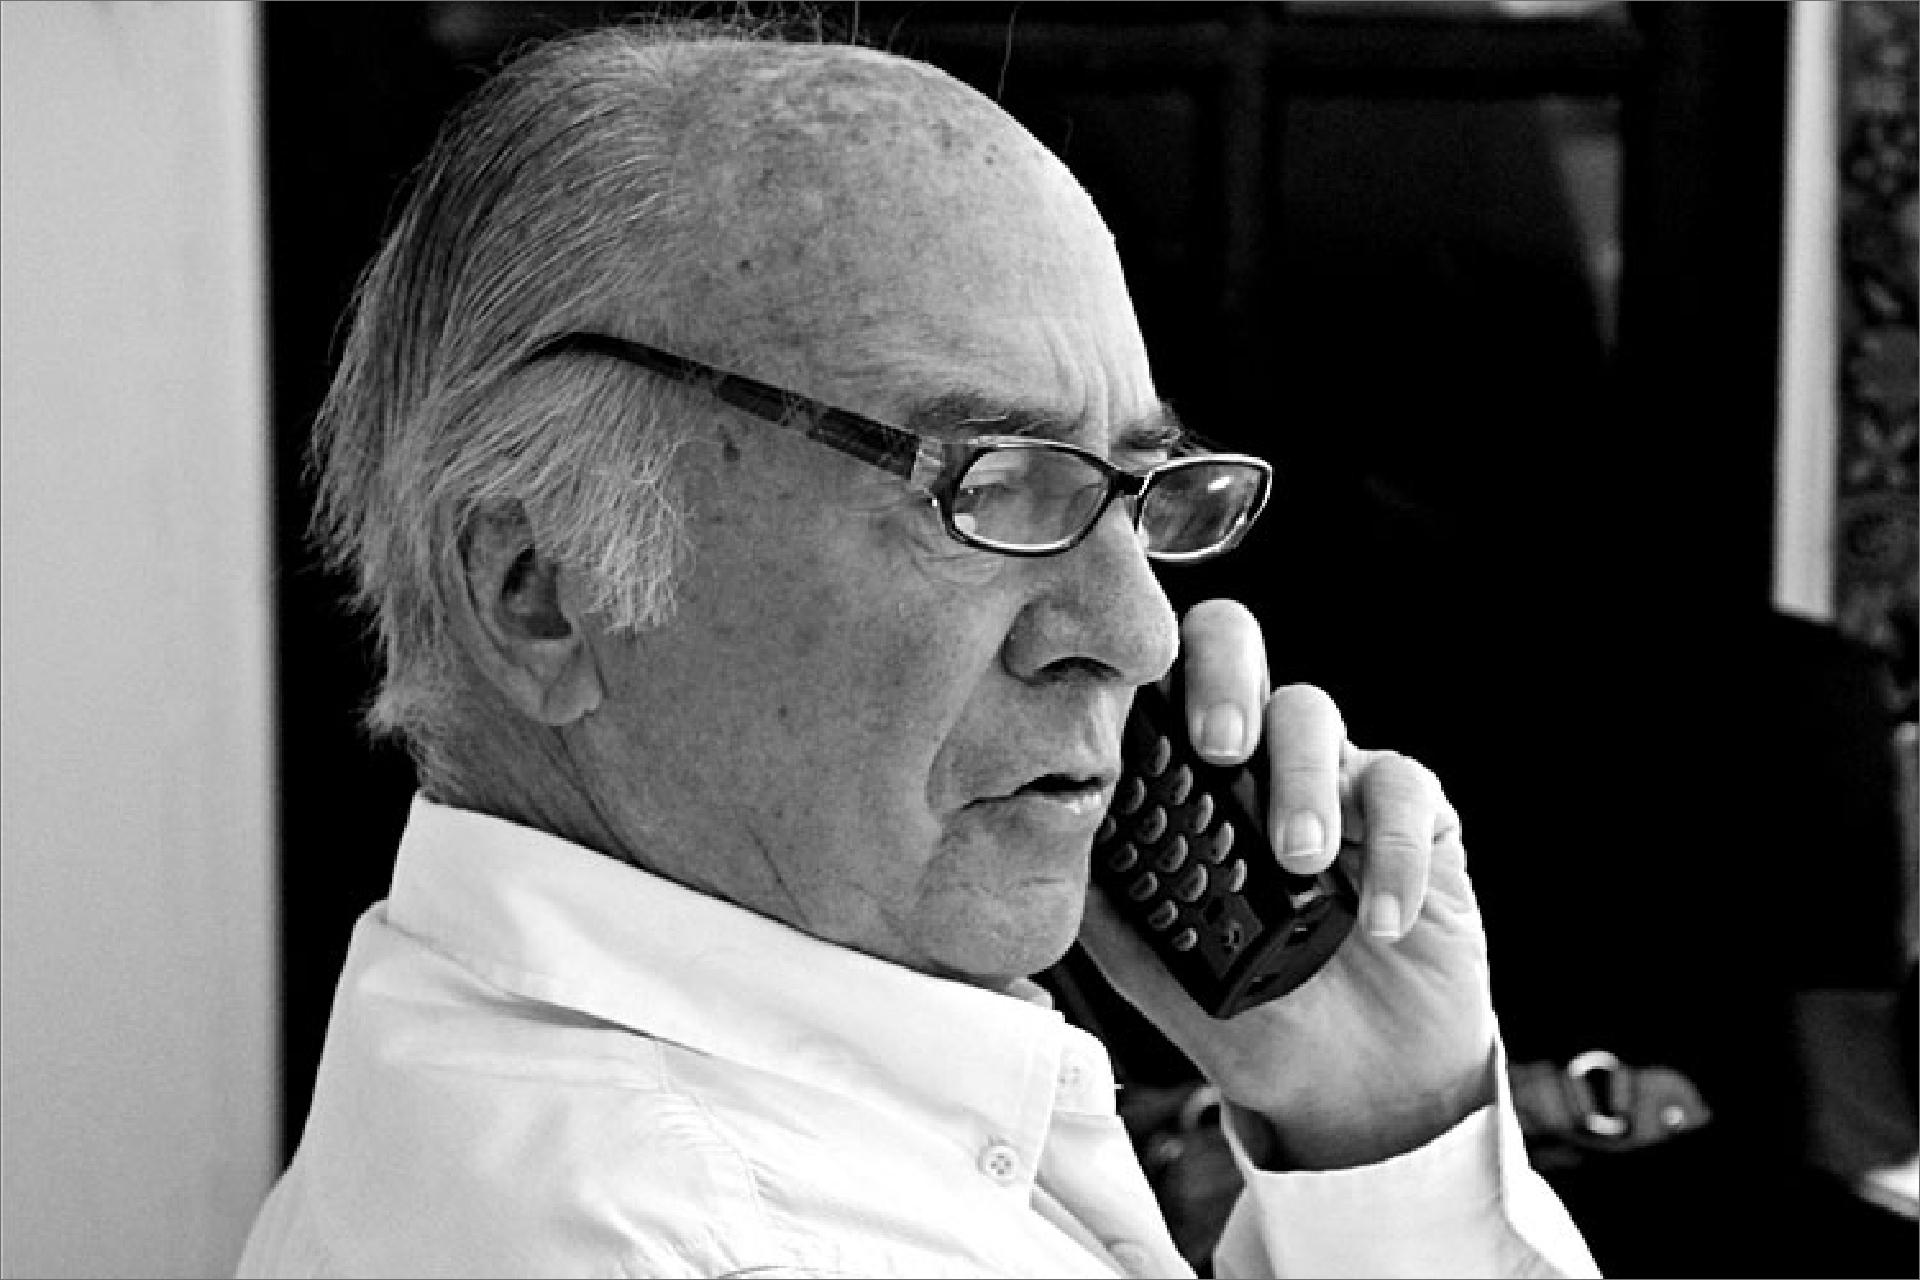 DON MARCOS URANGA (1936-2021)